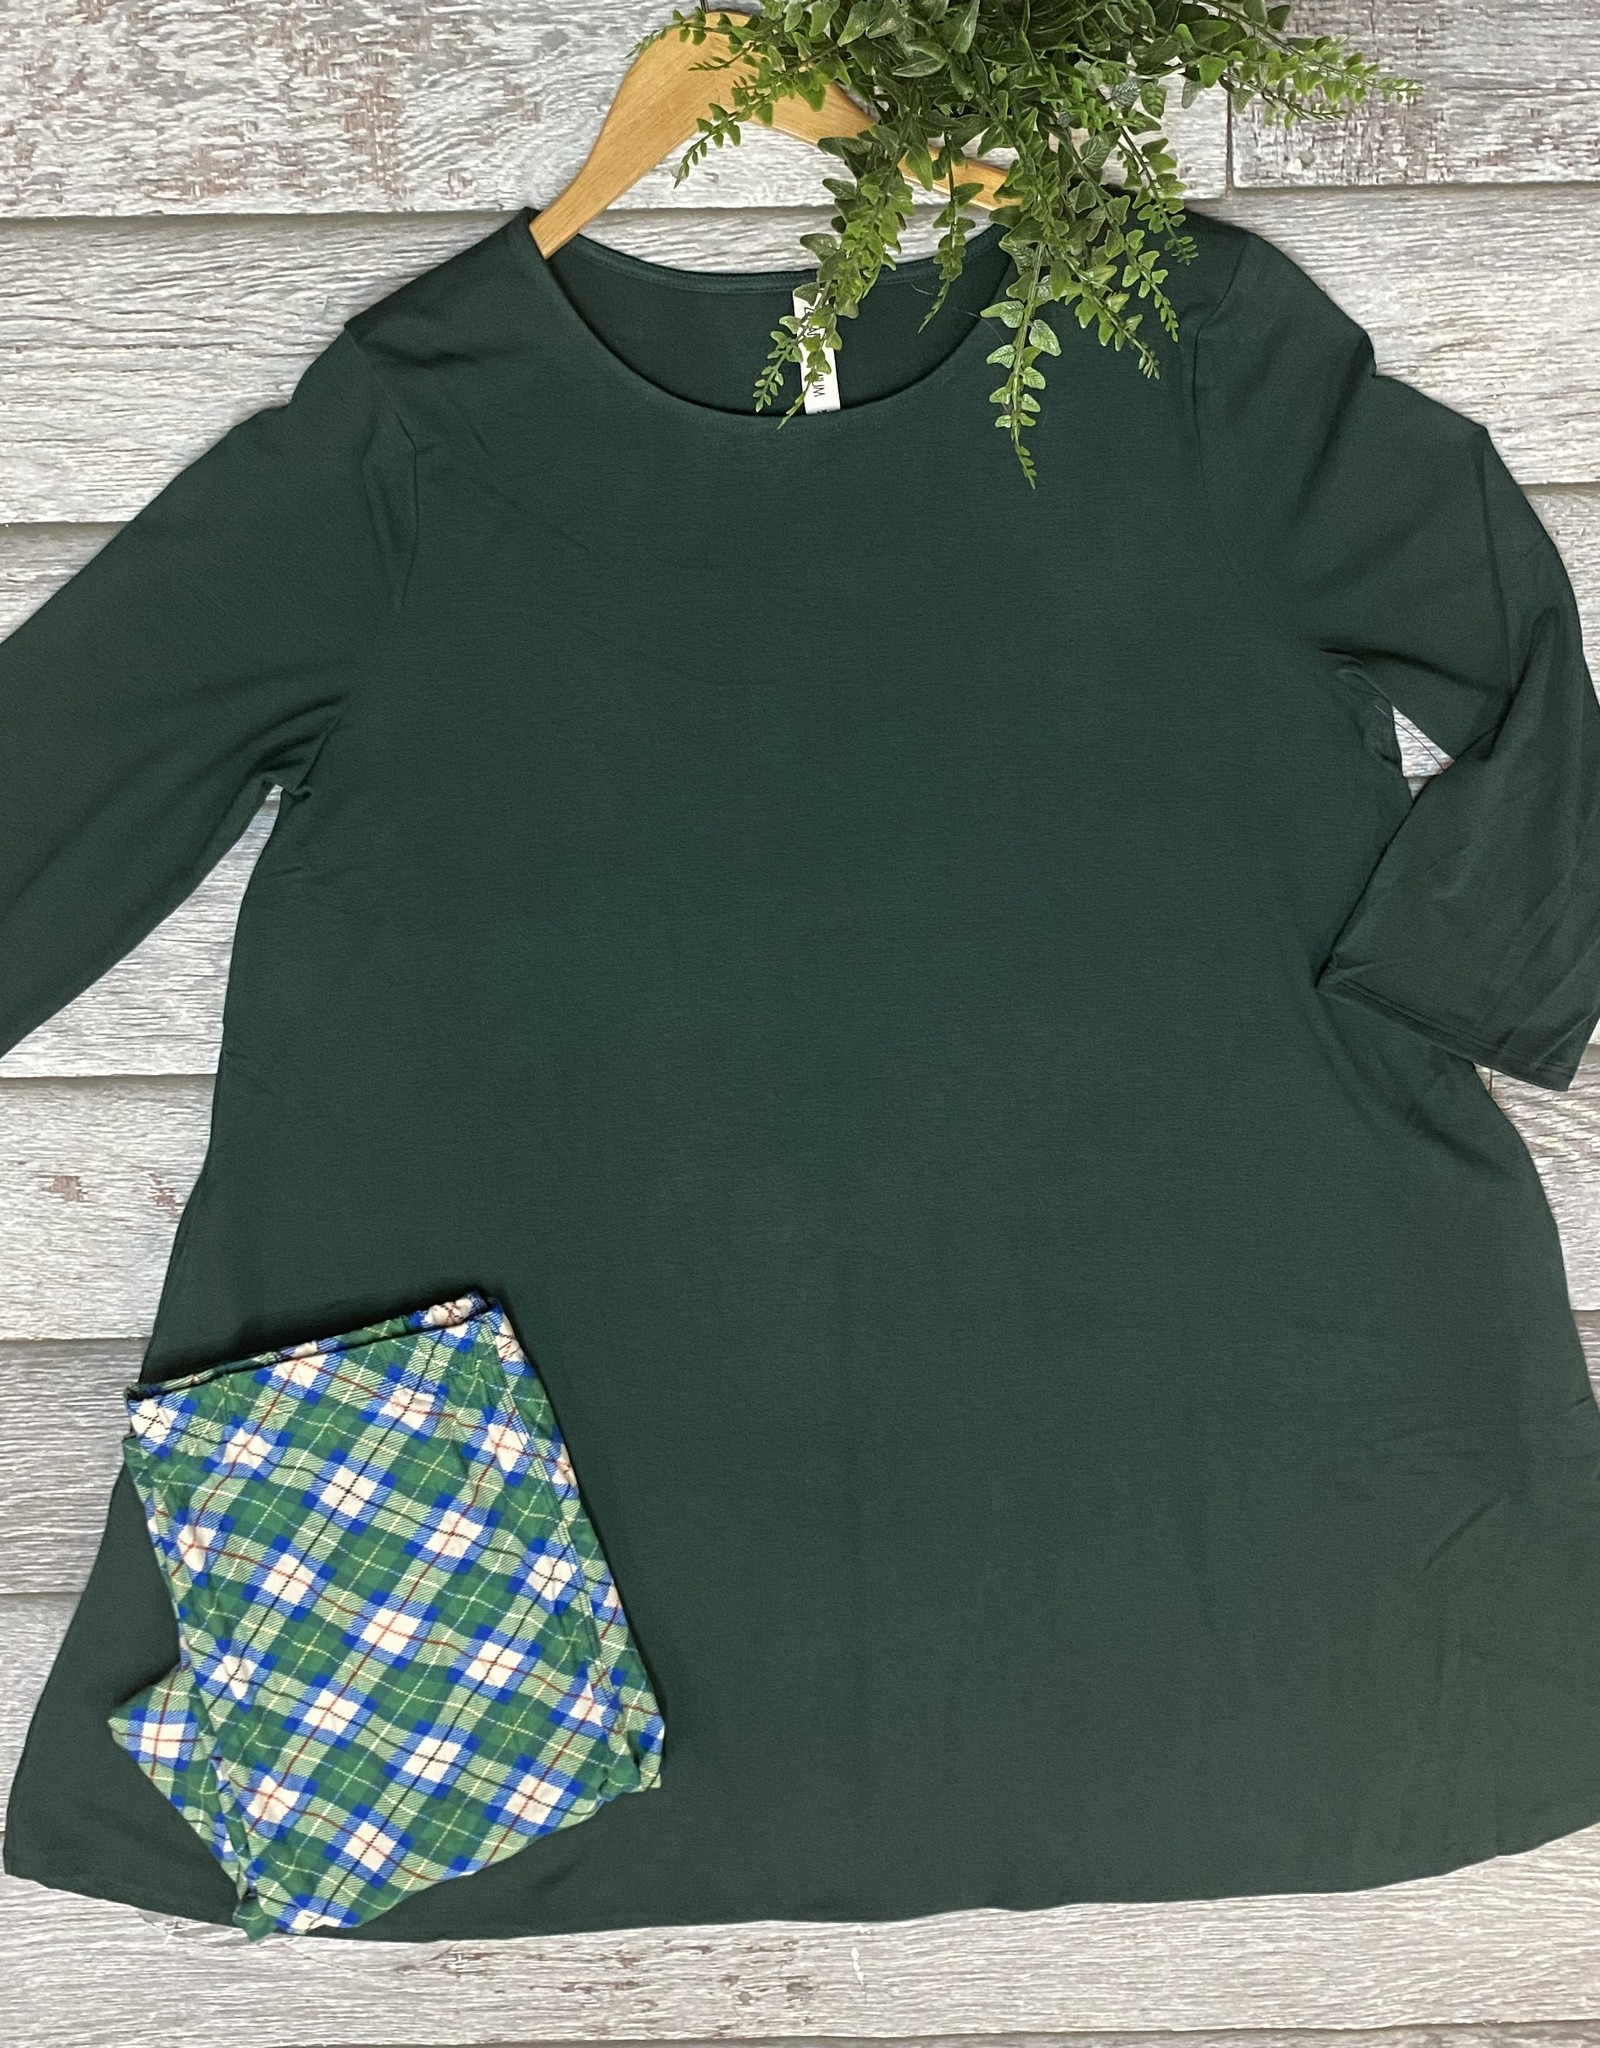 SASS Boutique Exclusive Green Plaid Leggings